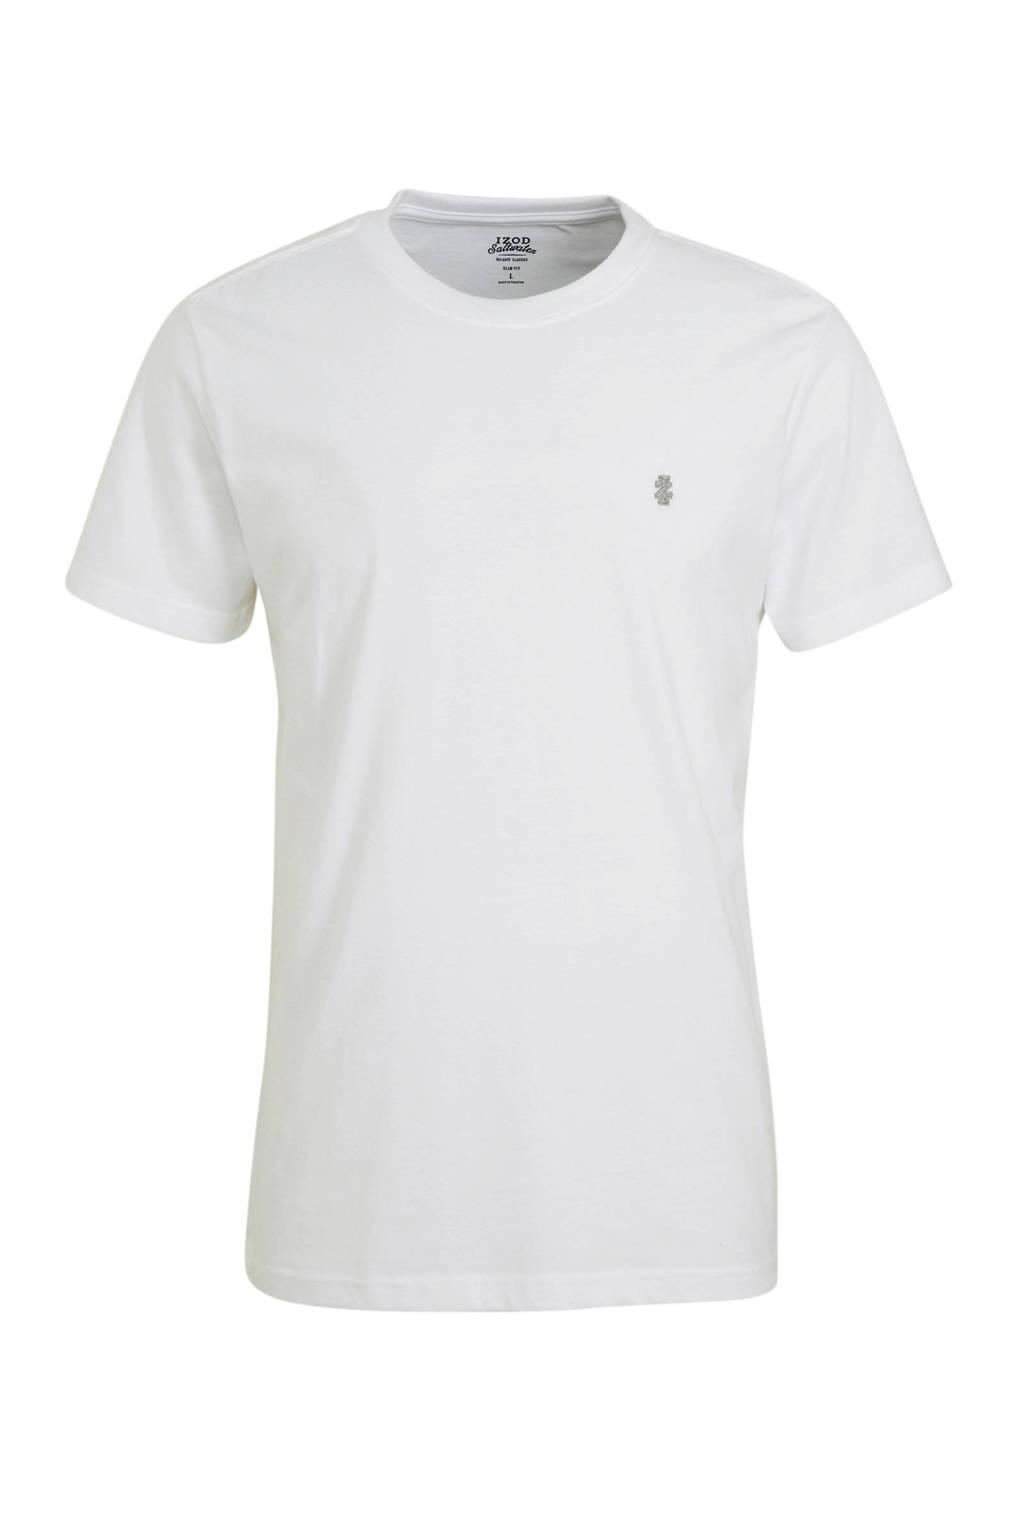 IZOD T-shirt wit, Wit